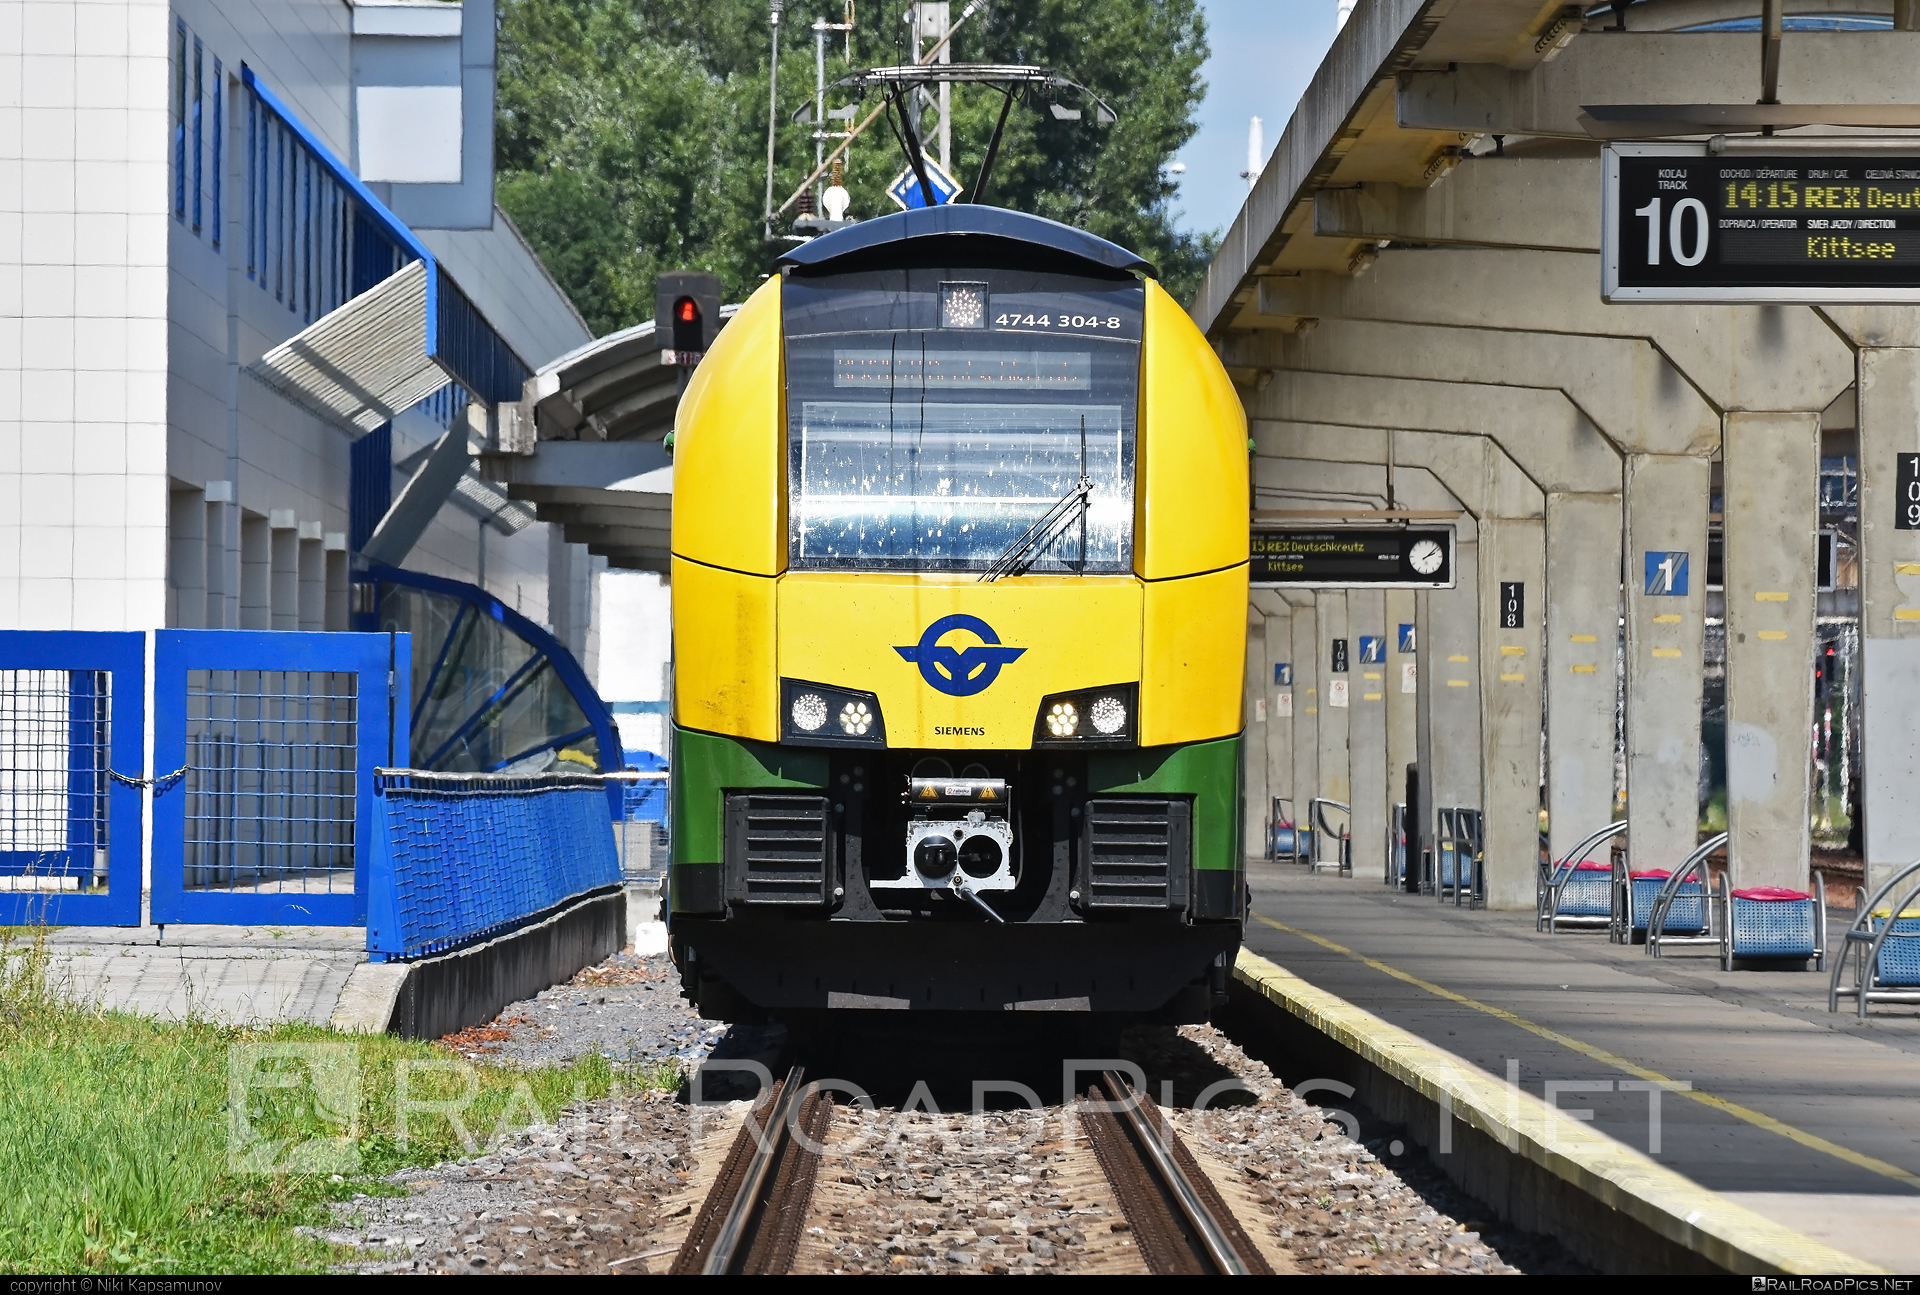 Siemens Desiro ML - 4744 304-8 operated by GYSEV - Györ-Sopron-Ebenfurti Vasut Részvénytarsasag #desiro #desiroml #gyorsopronebenfurtivasutreszvenytarsasag #gysev #raaboedenburgebenfurtereisenbahn #raaboedenburgebenfurtereisenbahnag #roeee #siemens #siemensdesiro #siemensdesiroml